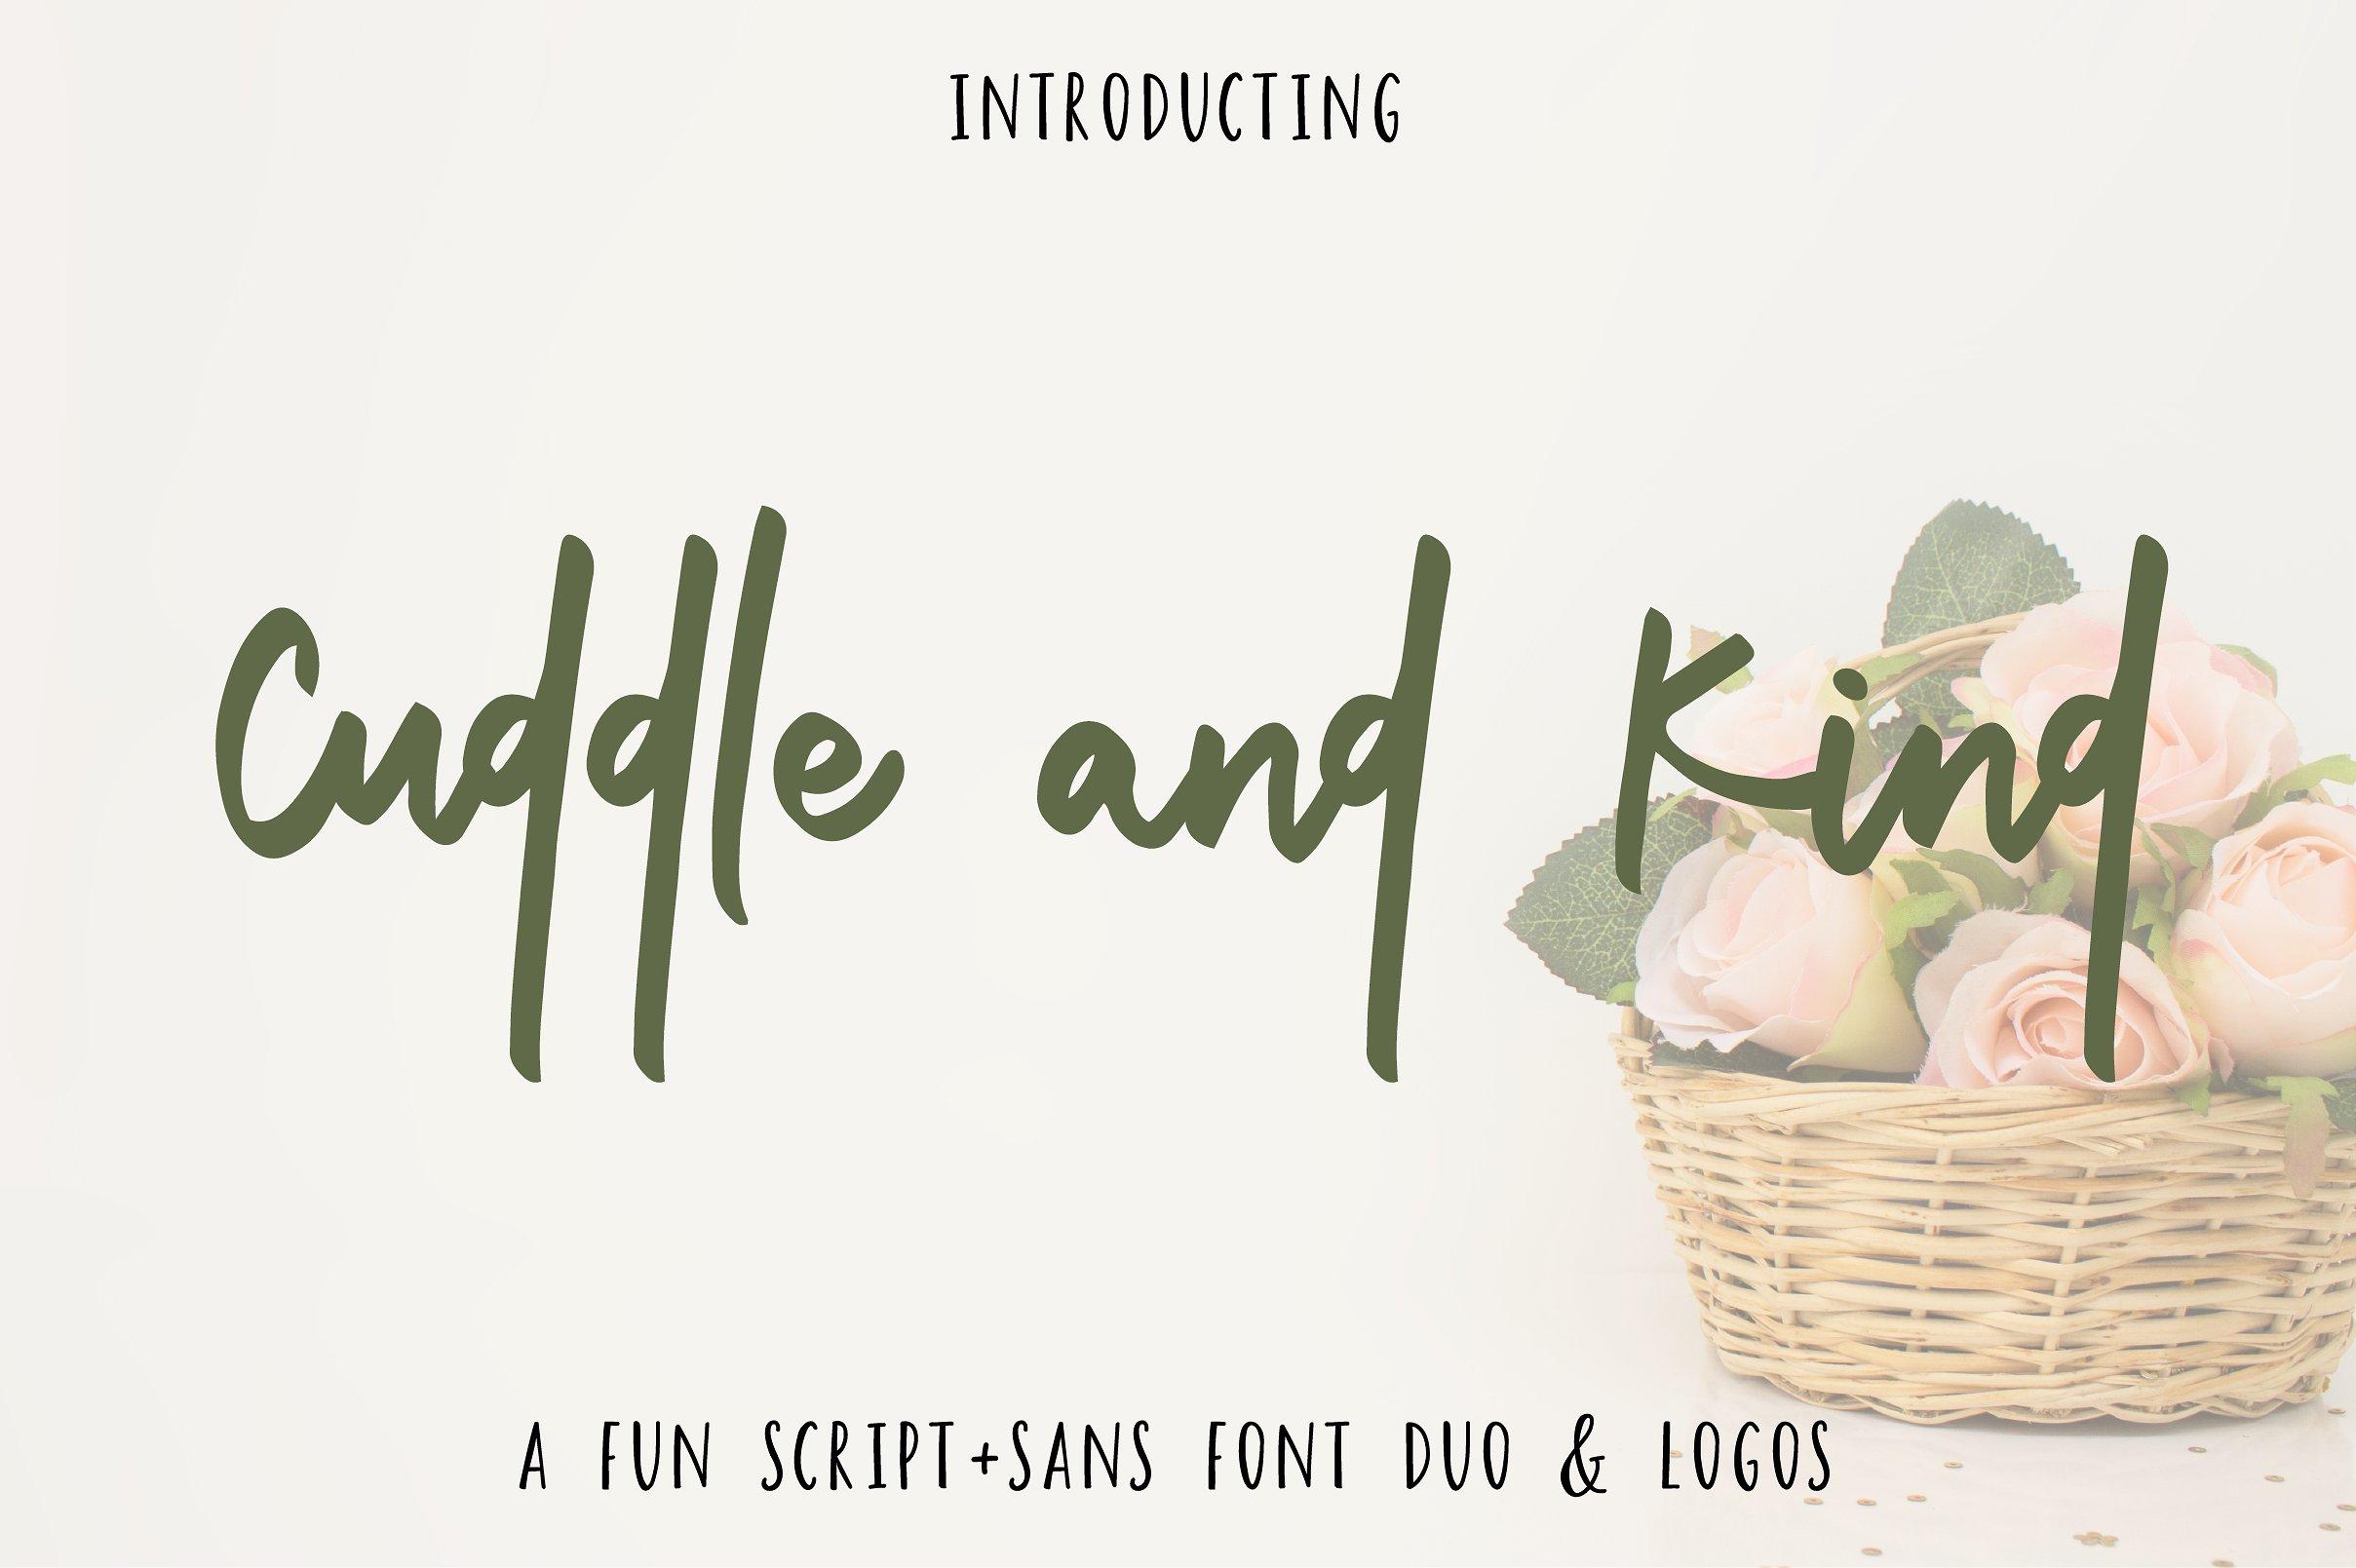 CuddleandKind手写连笔时尚海报英文字体下载